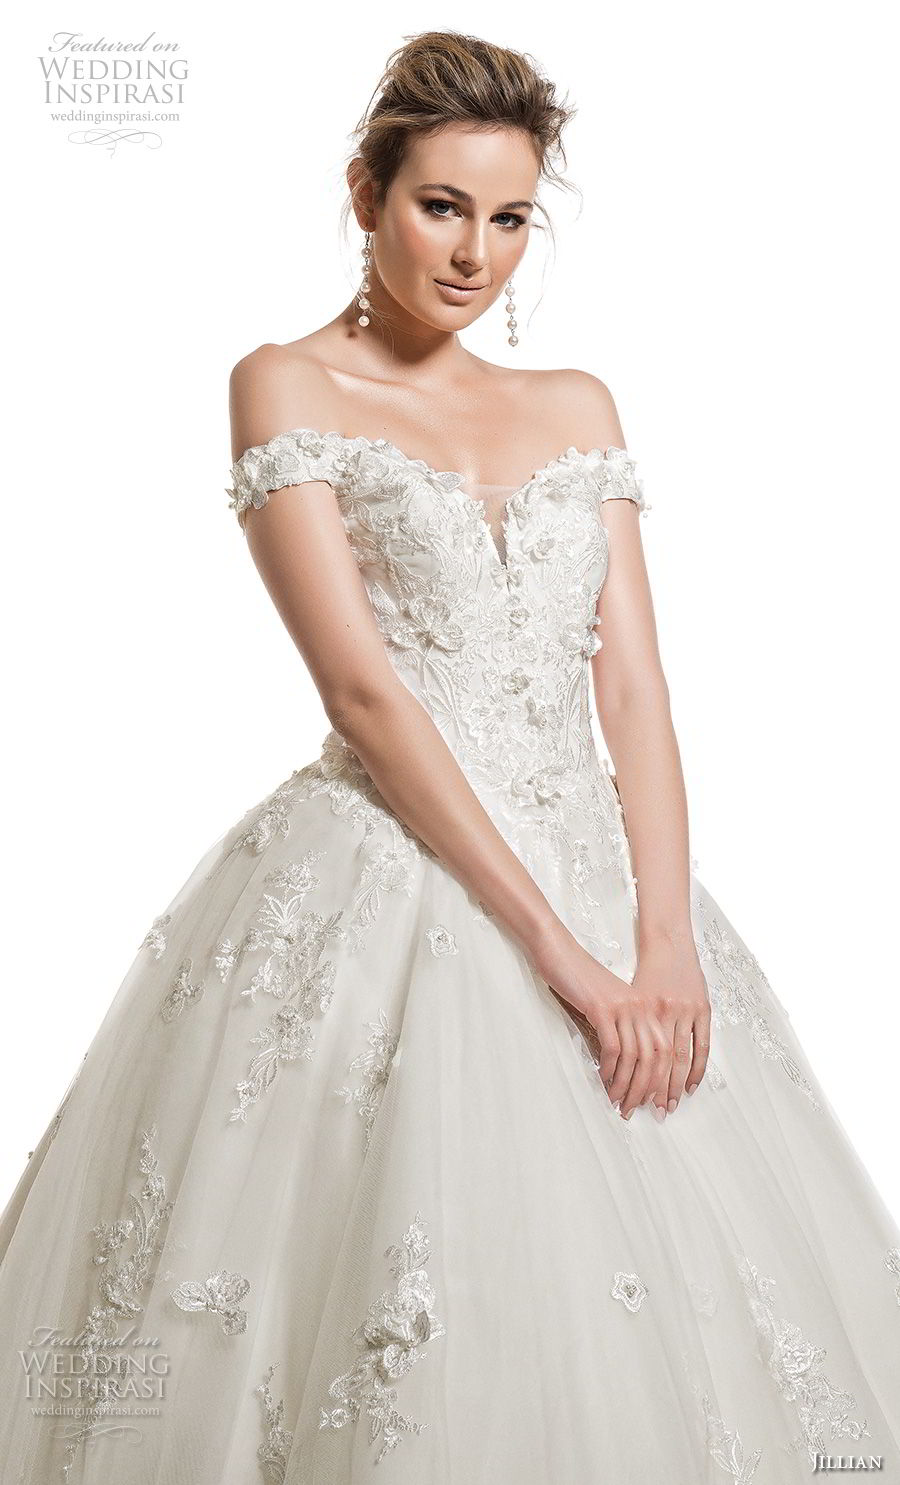 jillian 2019 bridal off the shoulder sweetheart neckline heavily embellished bodice princess romantic ball gown wedding dress royal train (2) zv